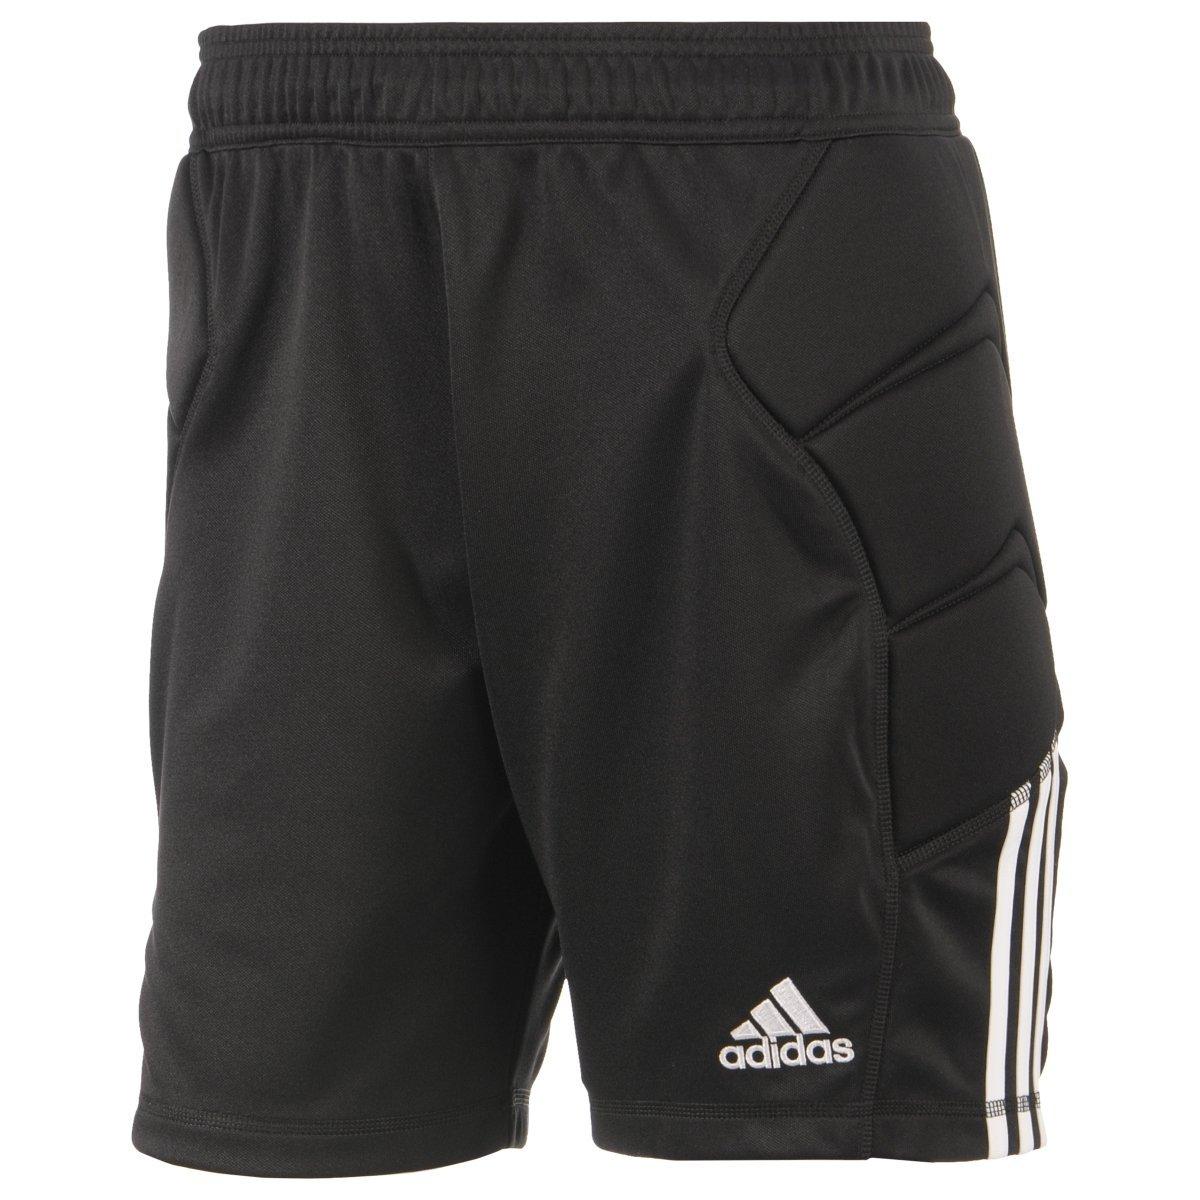 Šortky adidas TIERRO13 GK SHO